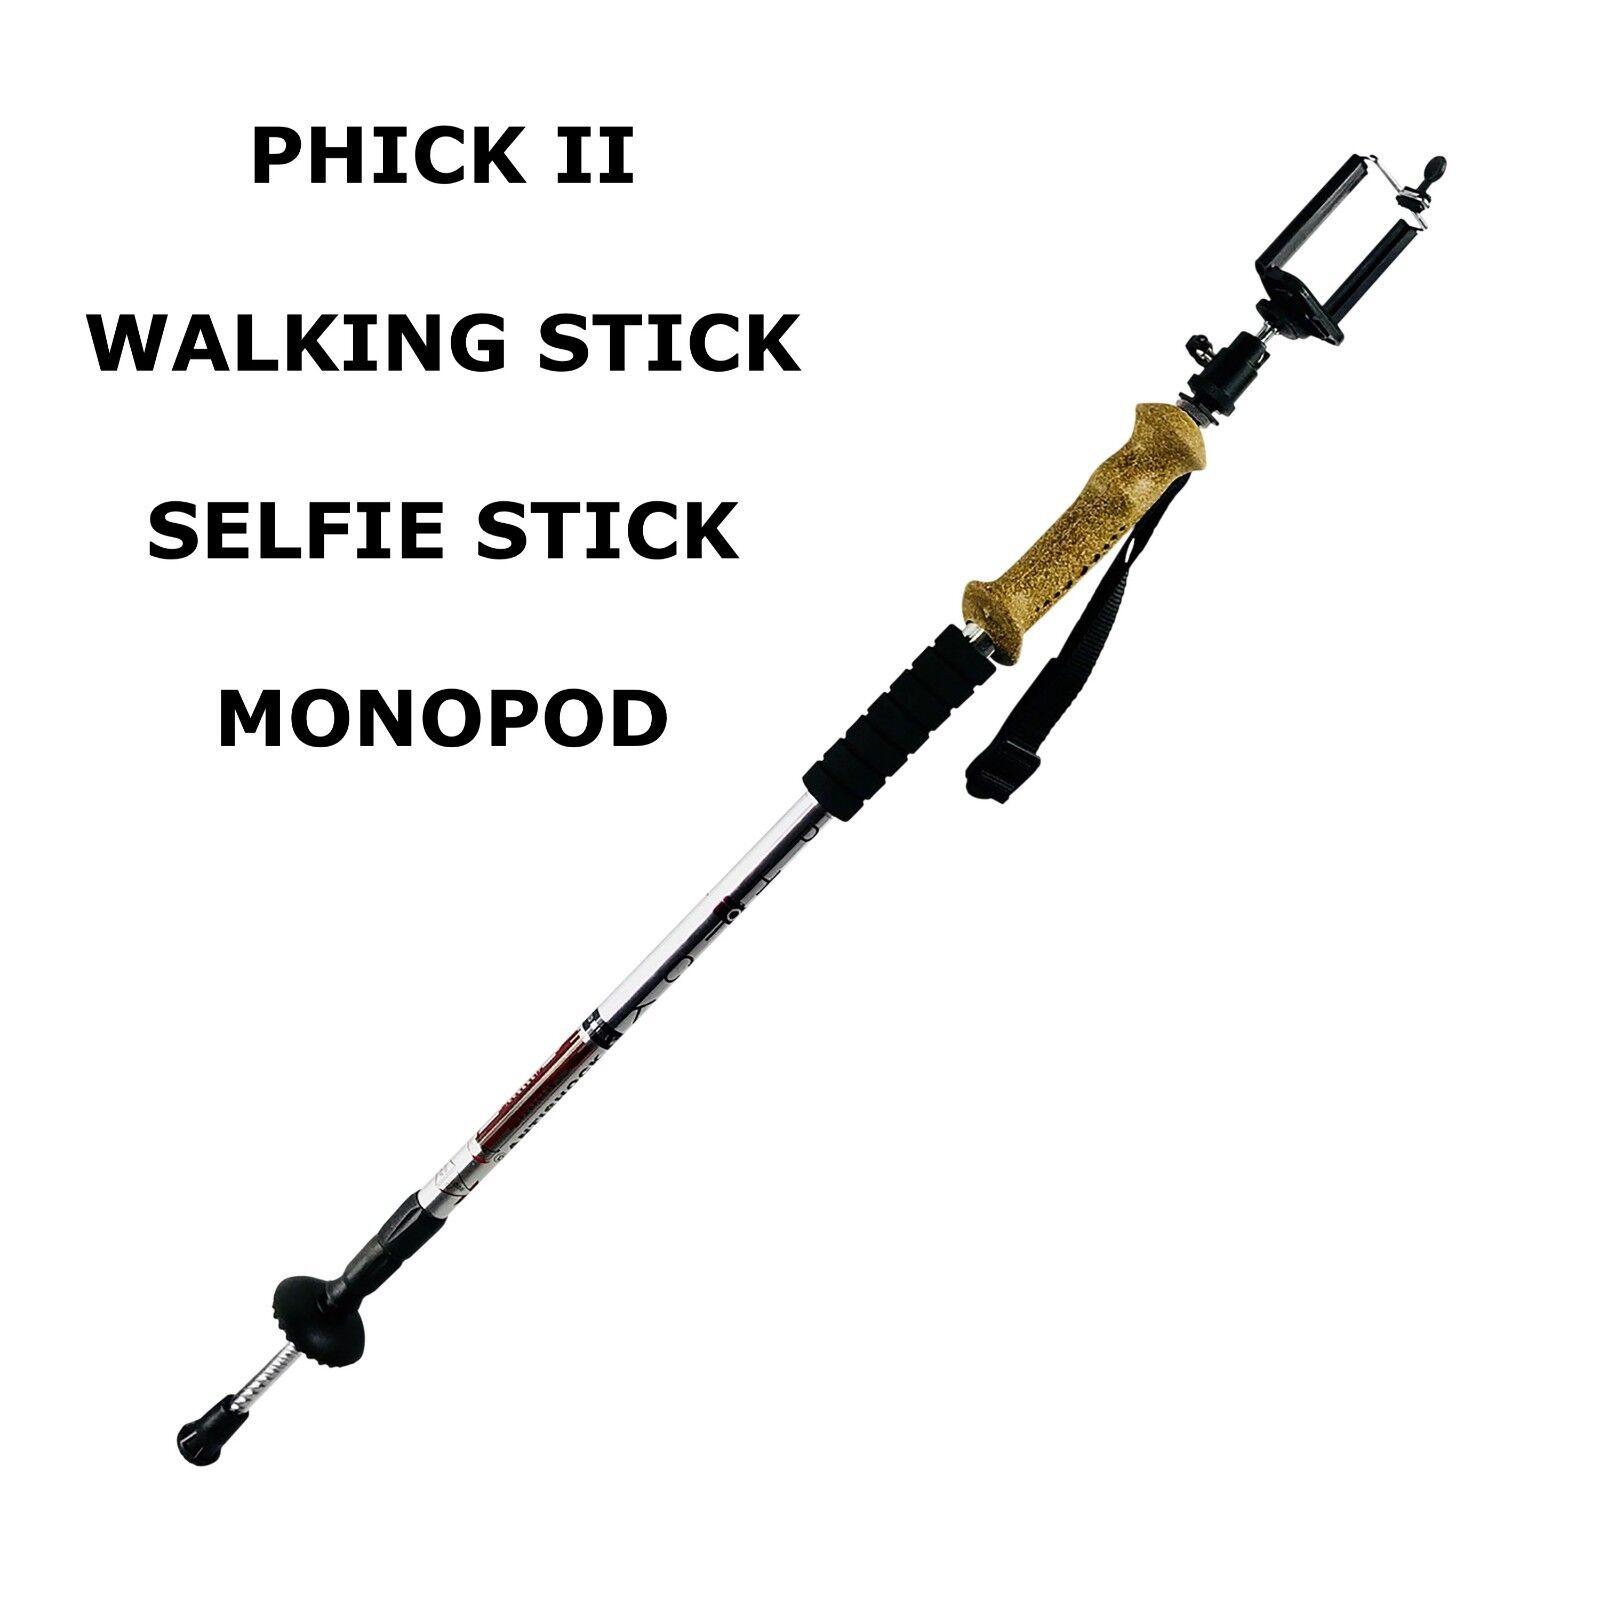 PHICK Hiking Walking Trekking Pole With Adjustable Camera Ph